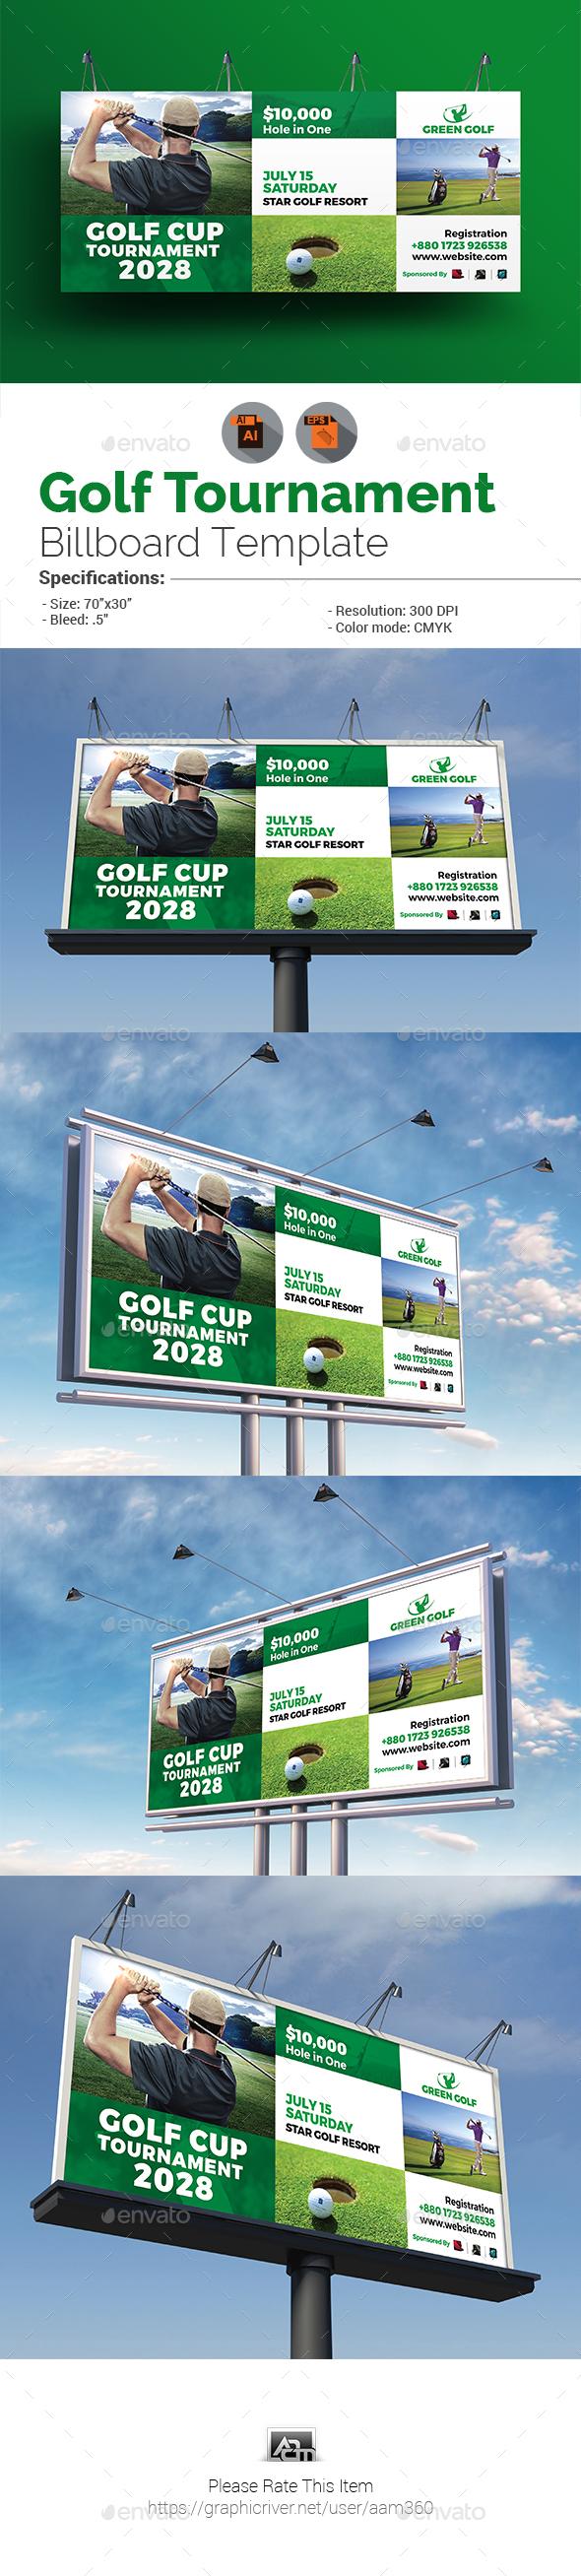 Golf Tournament Billboard Template - Signage Print Templates